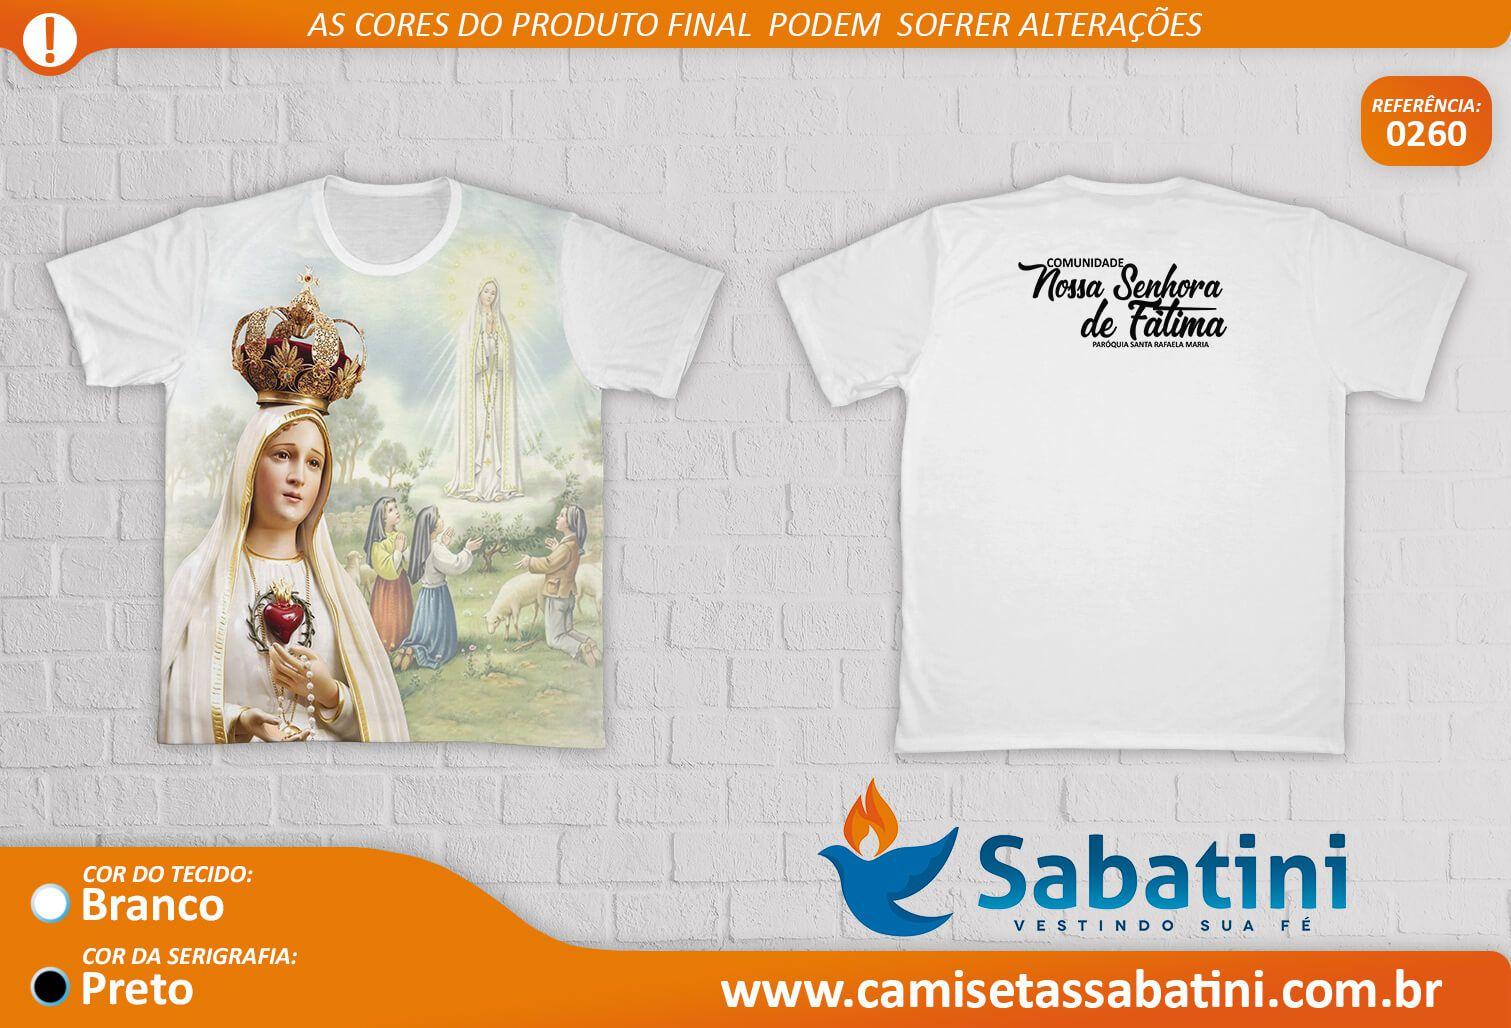 Camiseta Personalizada - NOSSA SENHORA DE FATIMA - Paróquia Santa Rafaela Maria - BARREIRAS - BA - ID:15060968  - Camisetas Sabatini